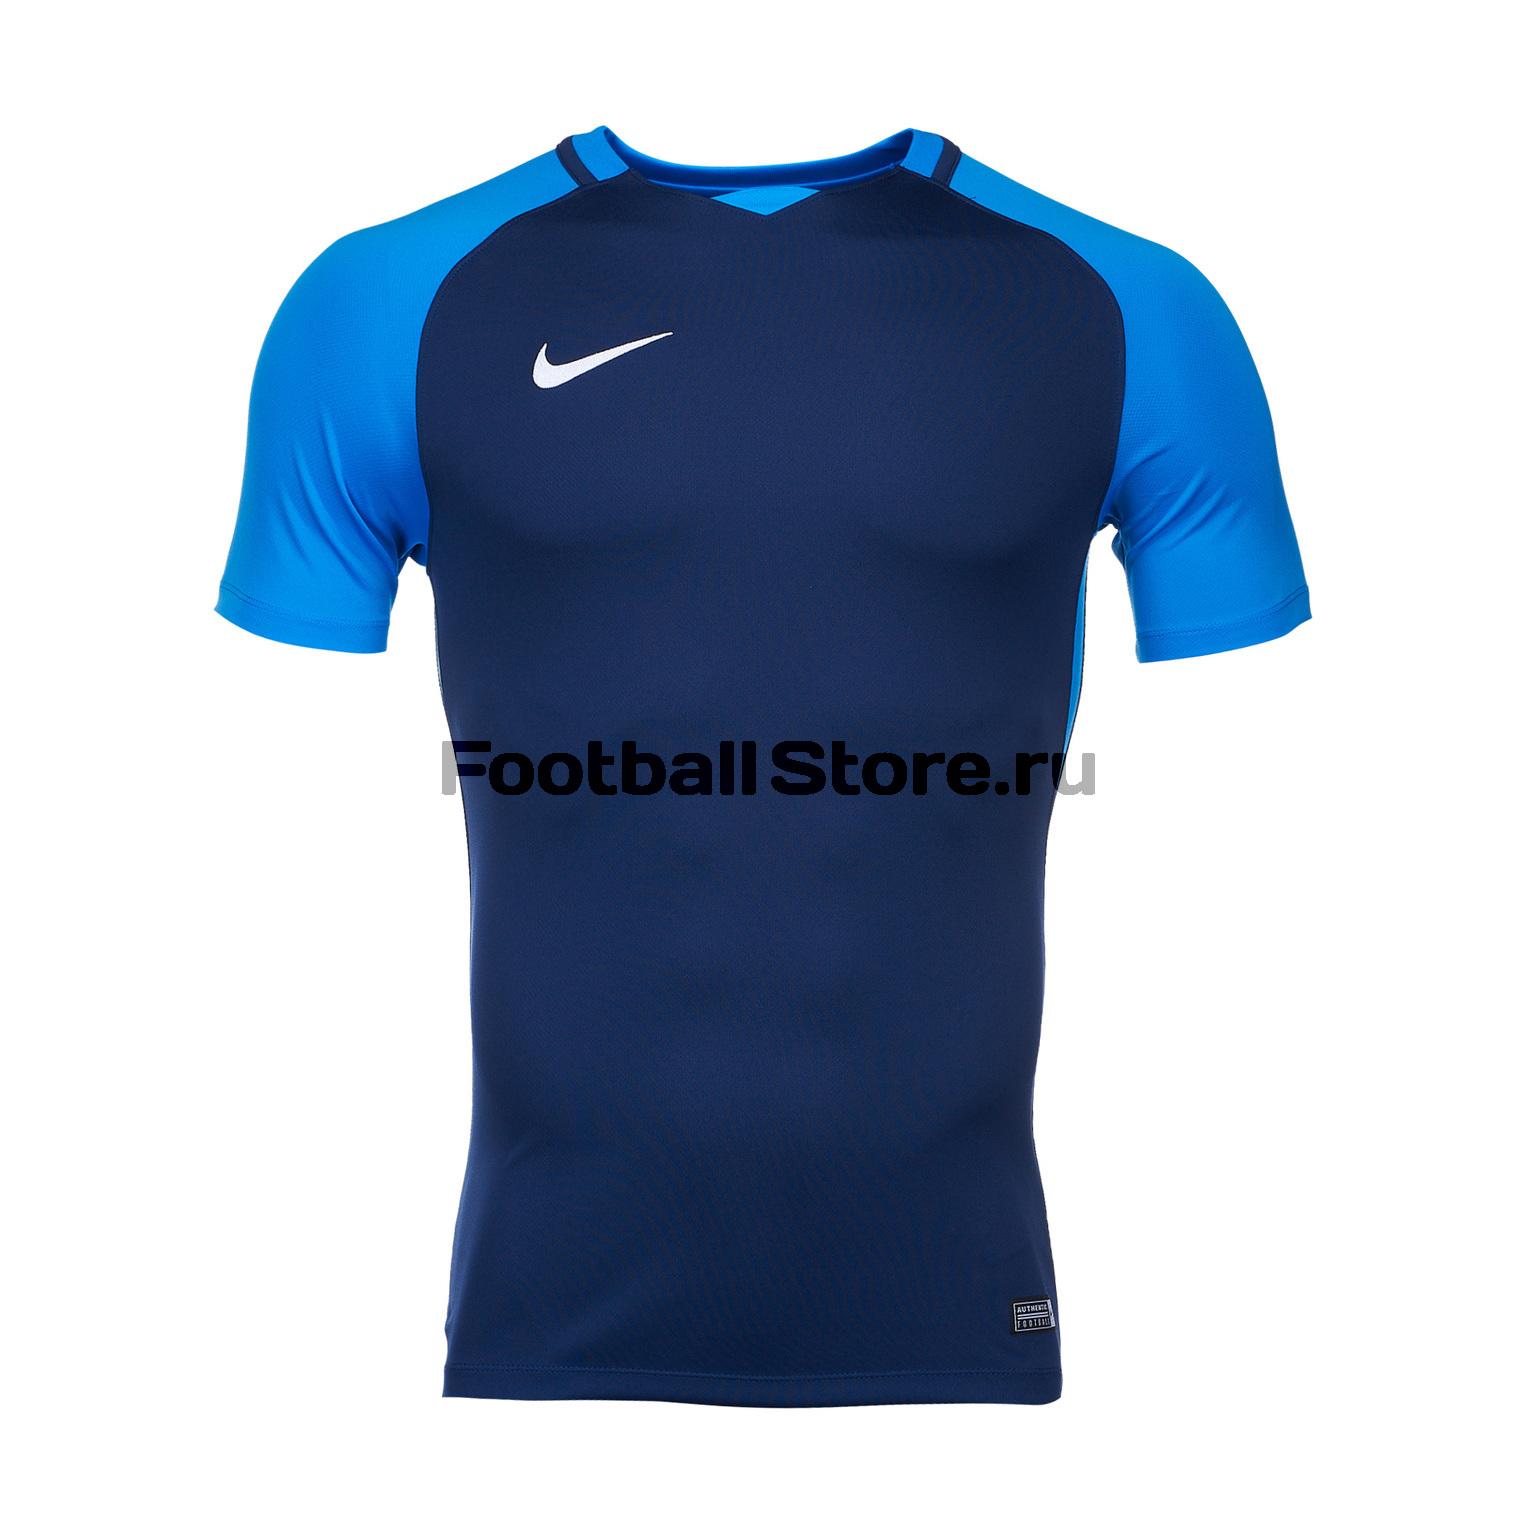 Футболка игровая Nike Trophy III 881483-411 футболка игровая nike dry tiempo prem jsy ss 894230 411